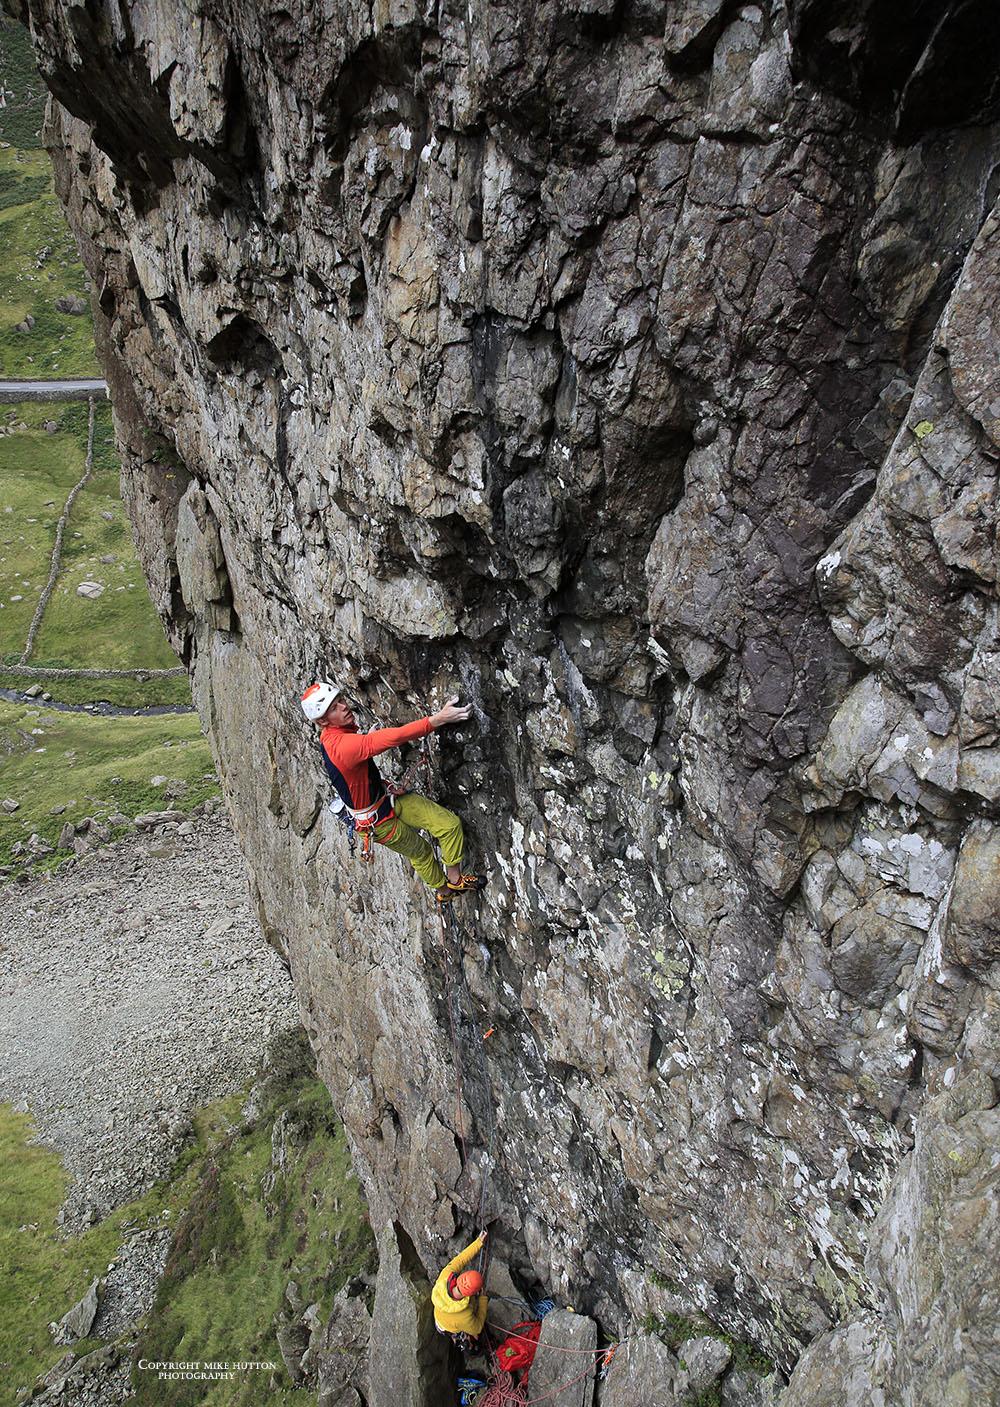 The 39 Slaps (E7 6c), Scimitar Ridge, Llanberis Pass. Photo: Mike Hutton